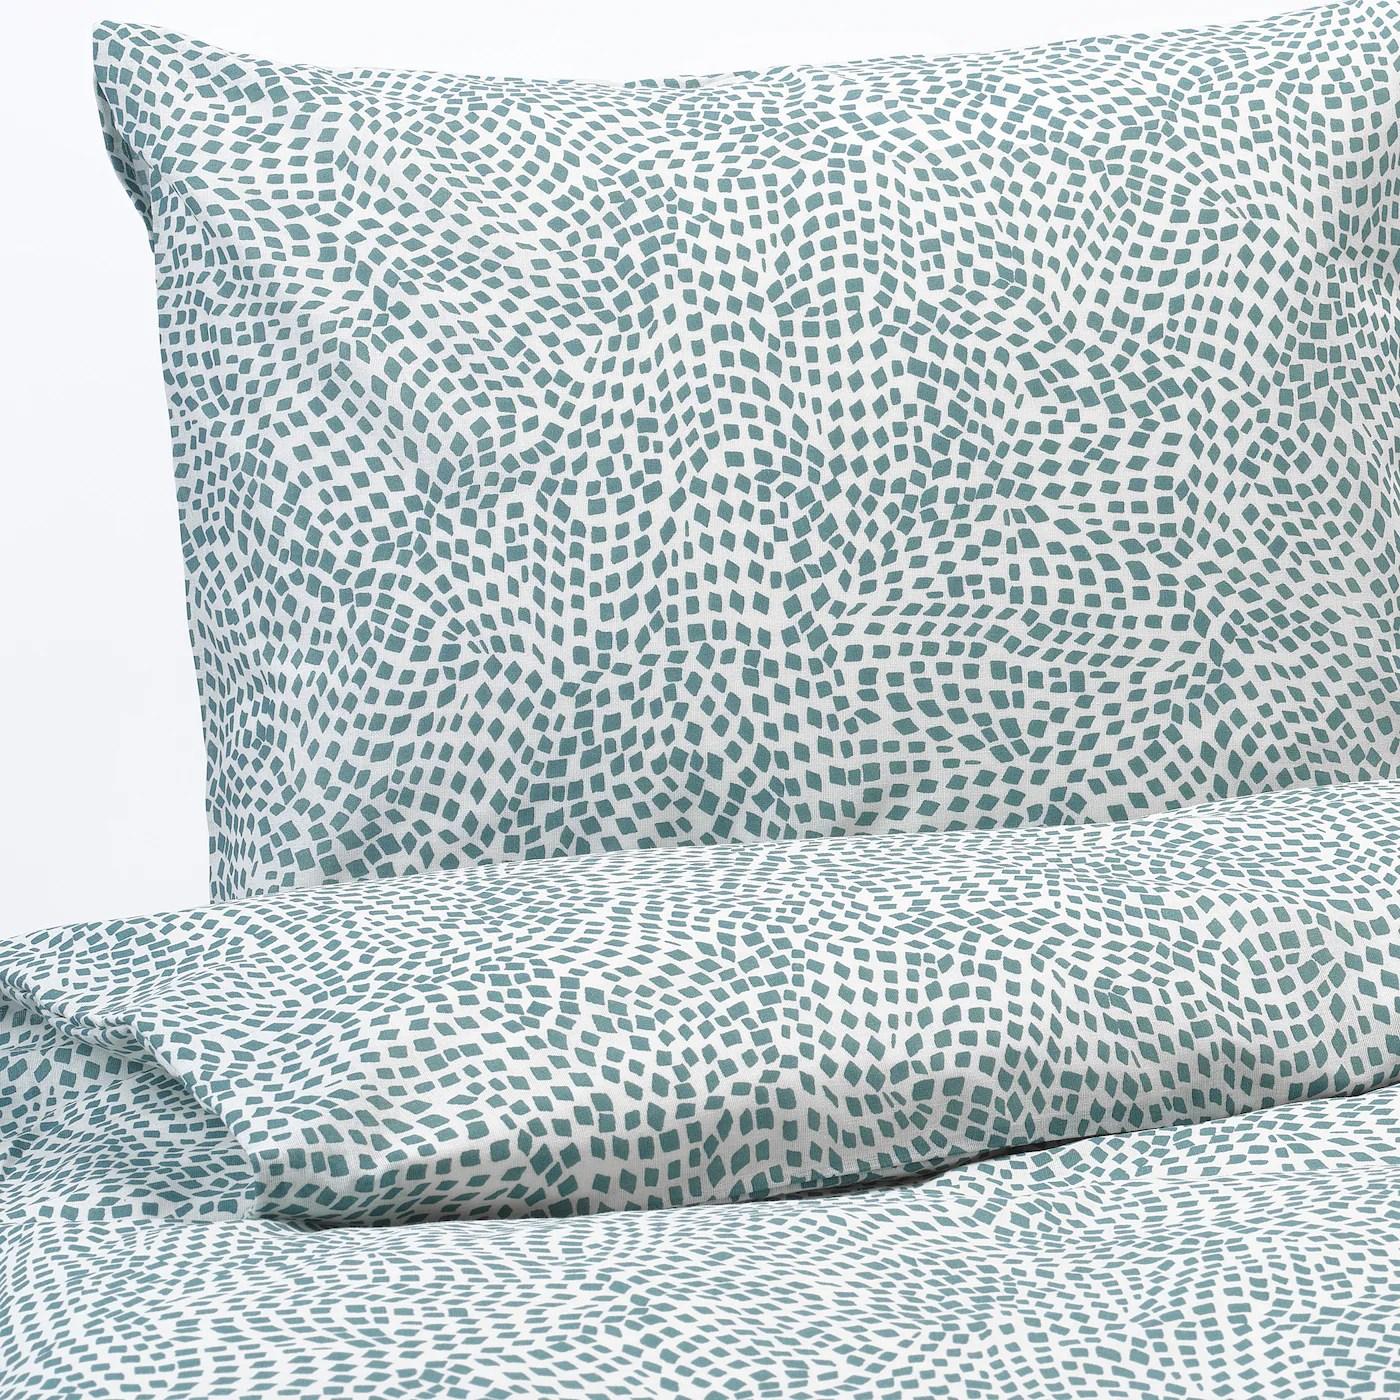 Tradkrassula Housse Couette 2 Taies Blanc Bleu 240x220 65x65 Cm Ikea